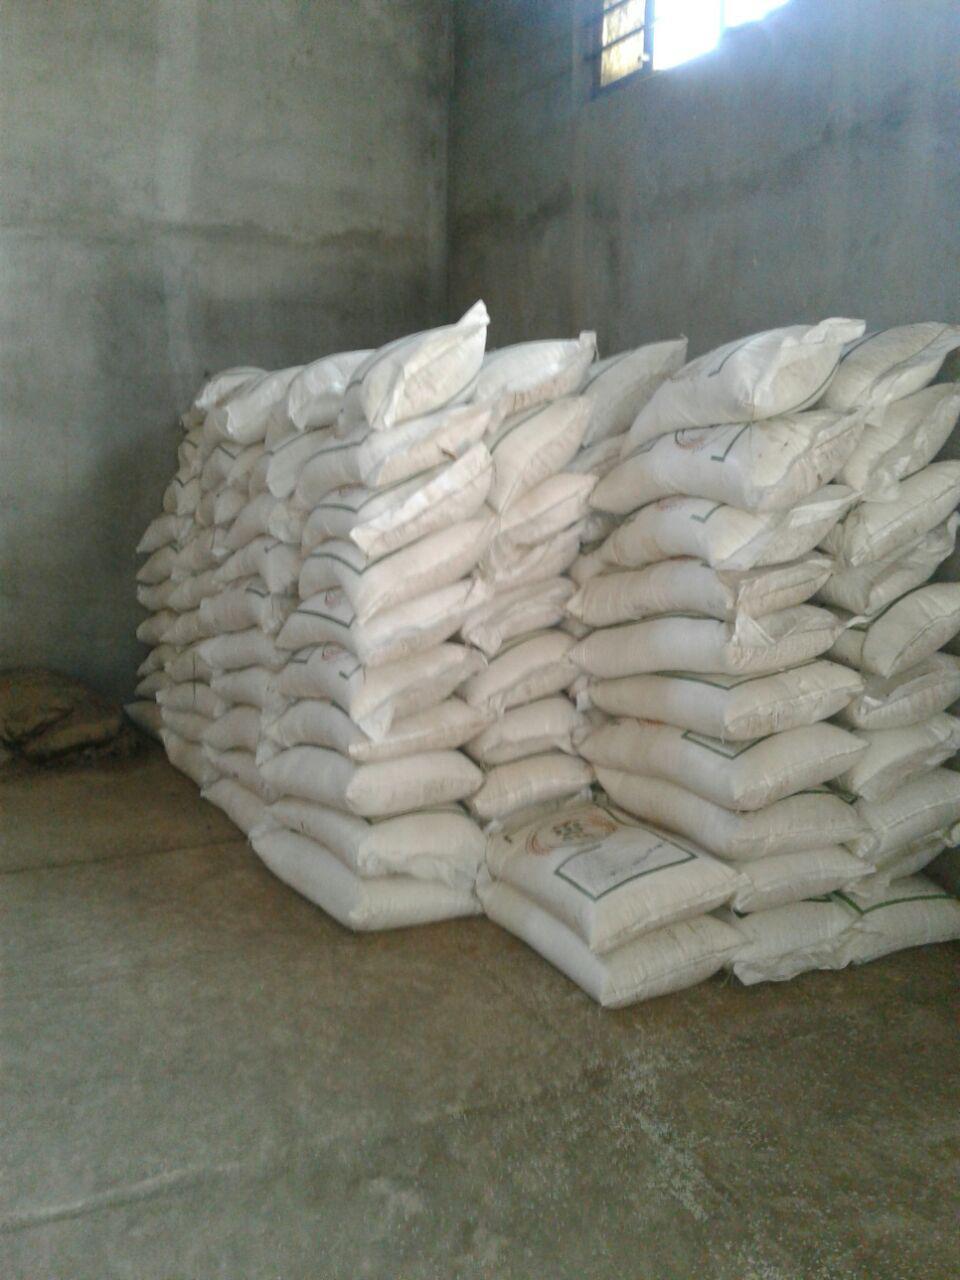 کشف 10 تن برنج قاچاق توسط پاسگاه تلمادره